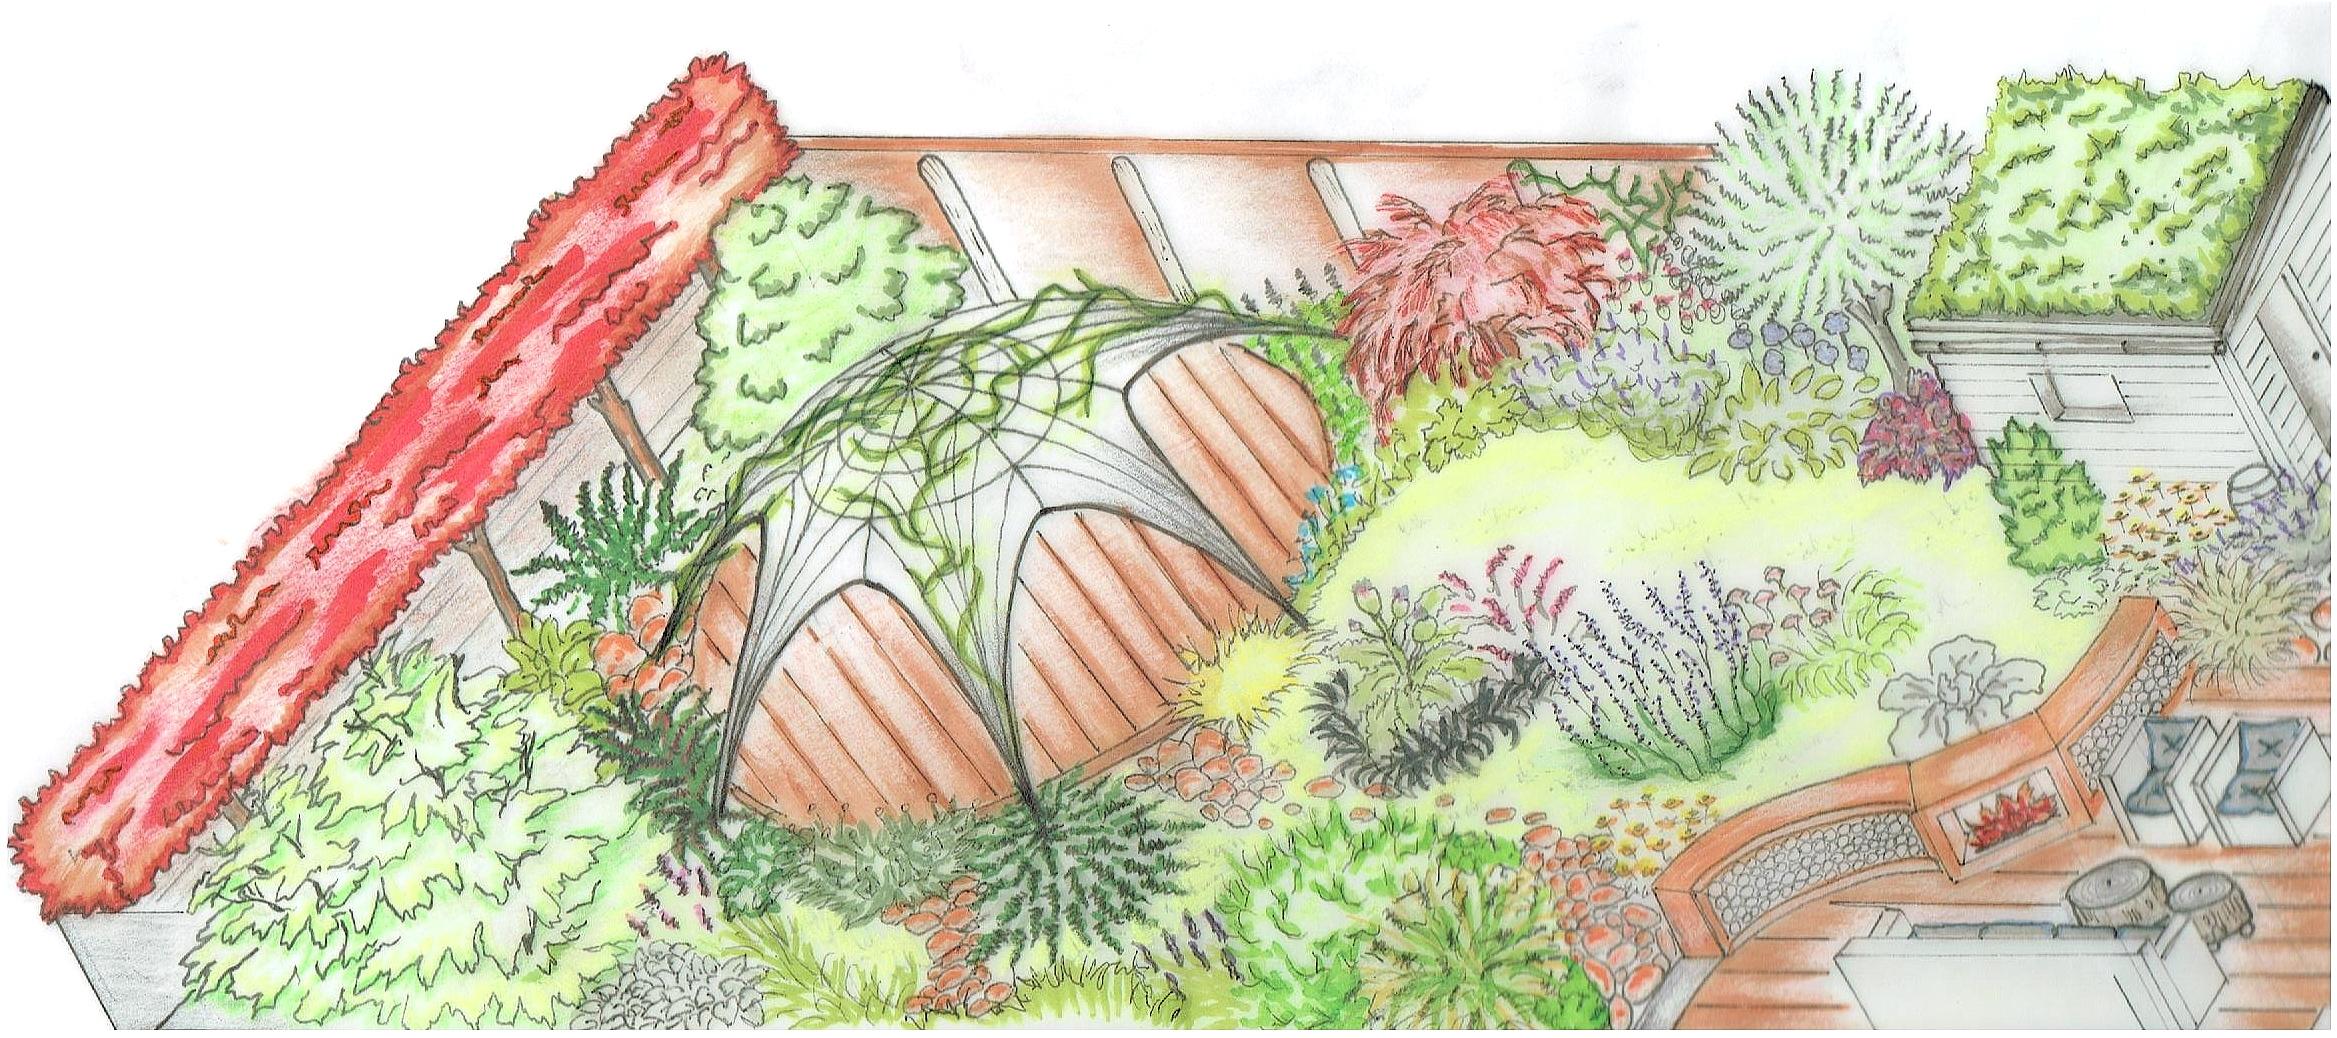 Tuinontwerp bij Tuinmankunst